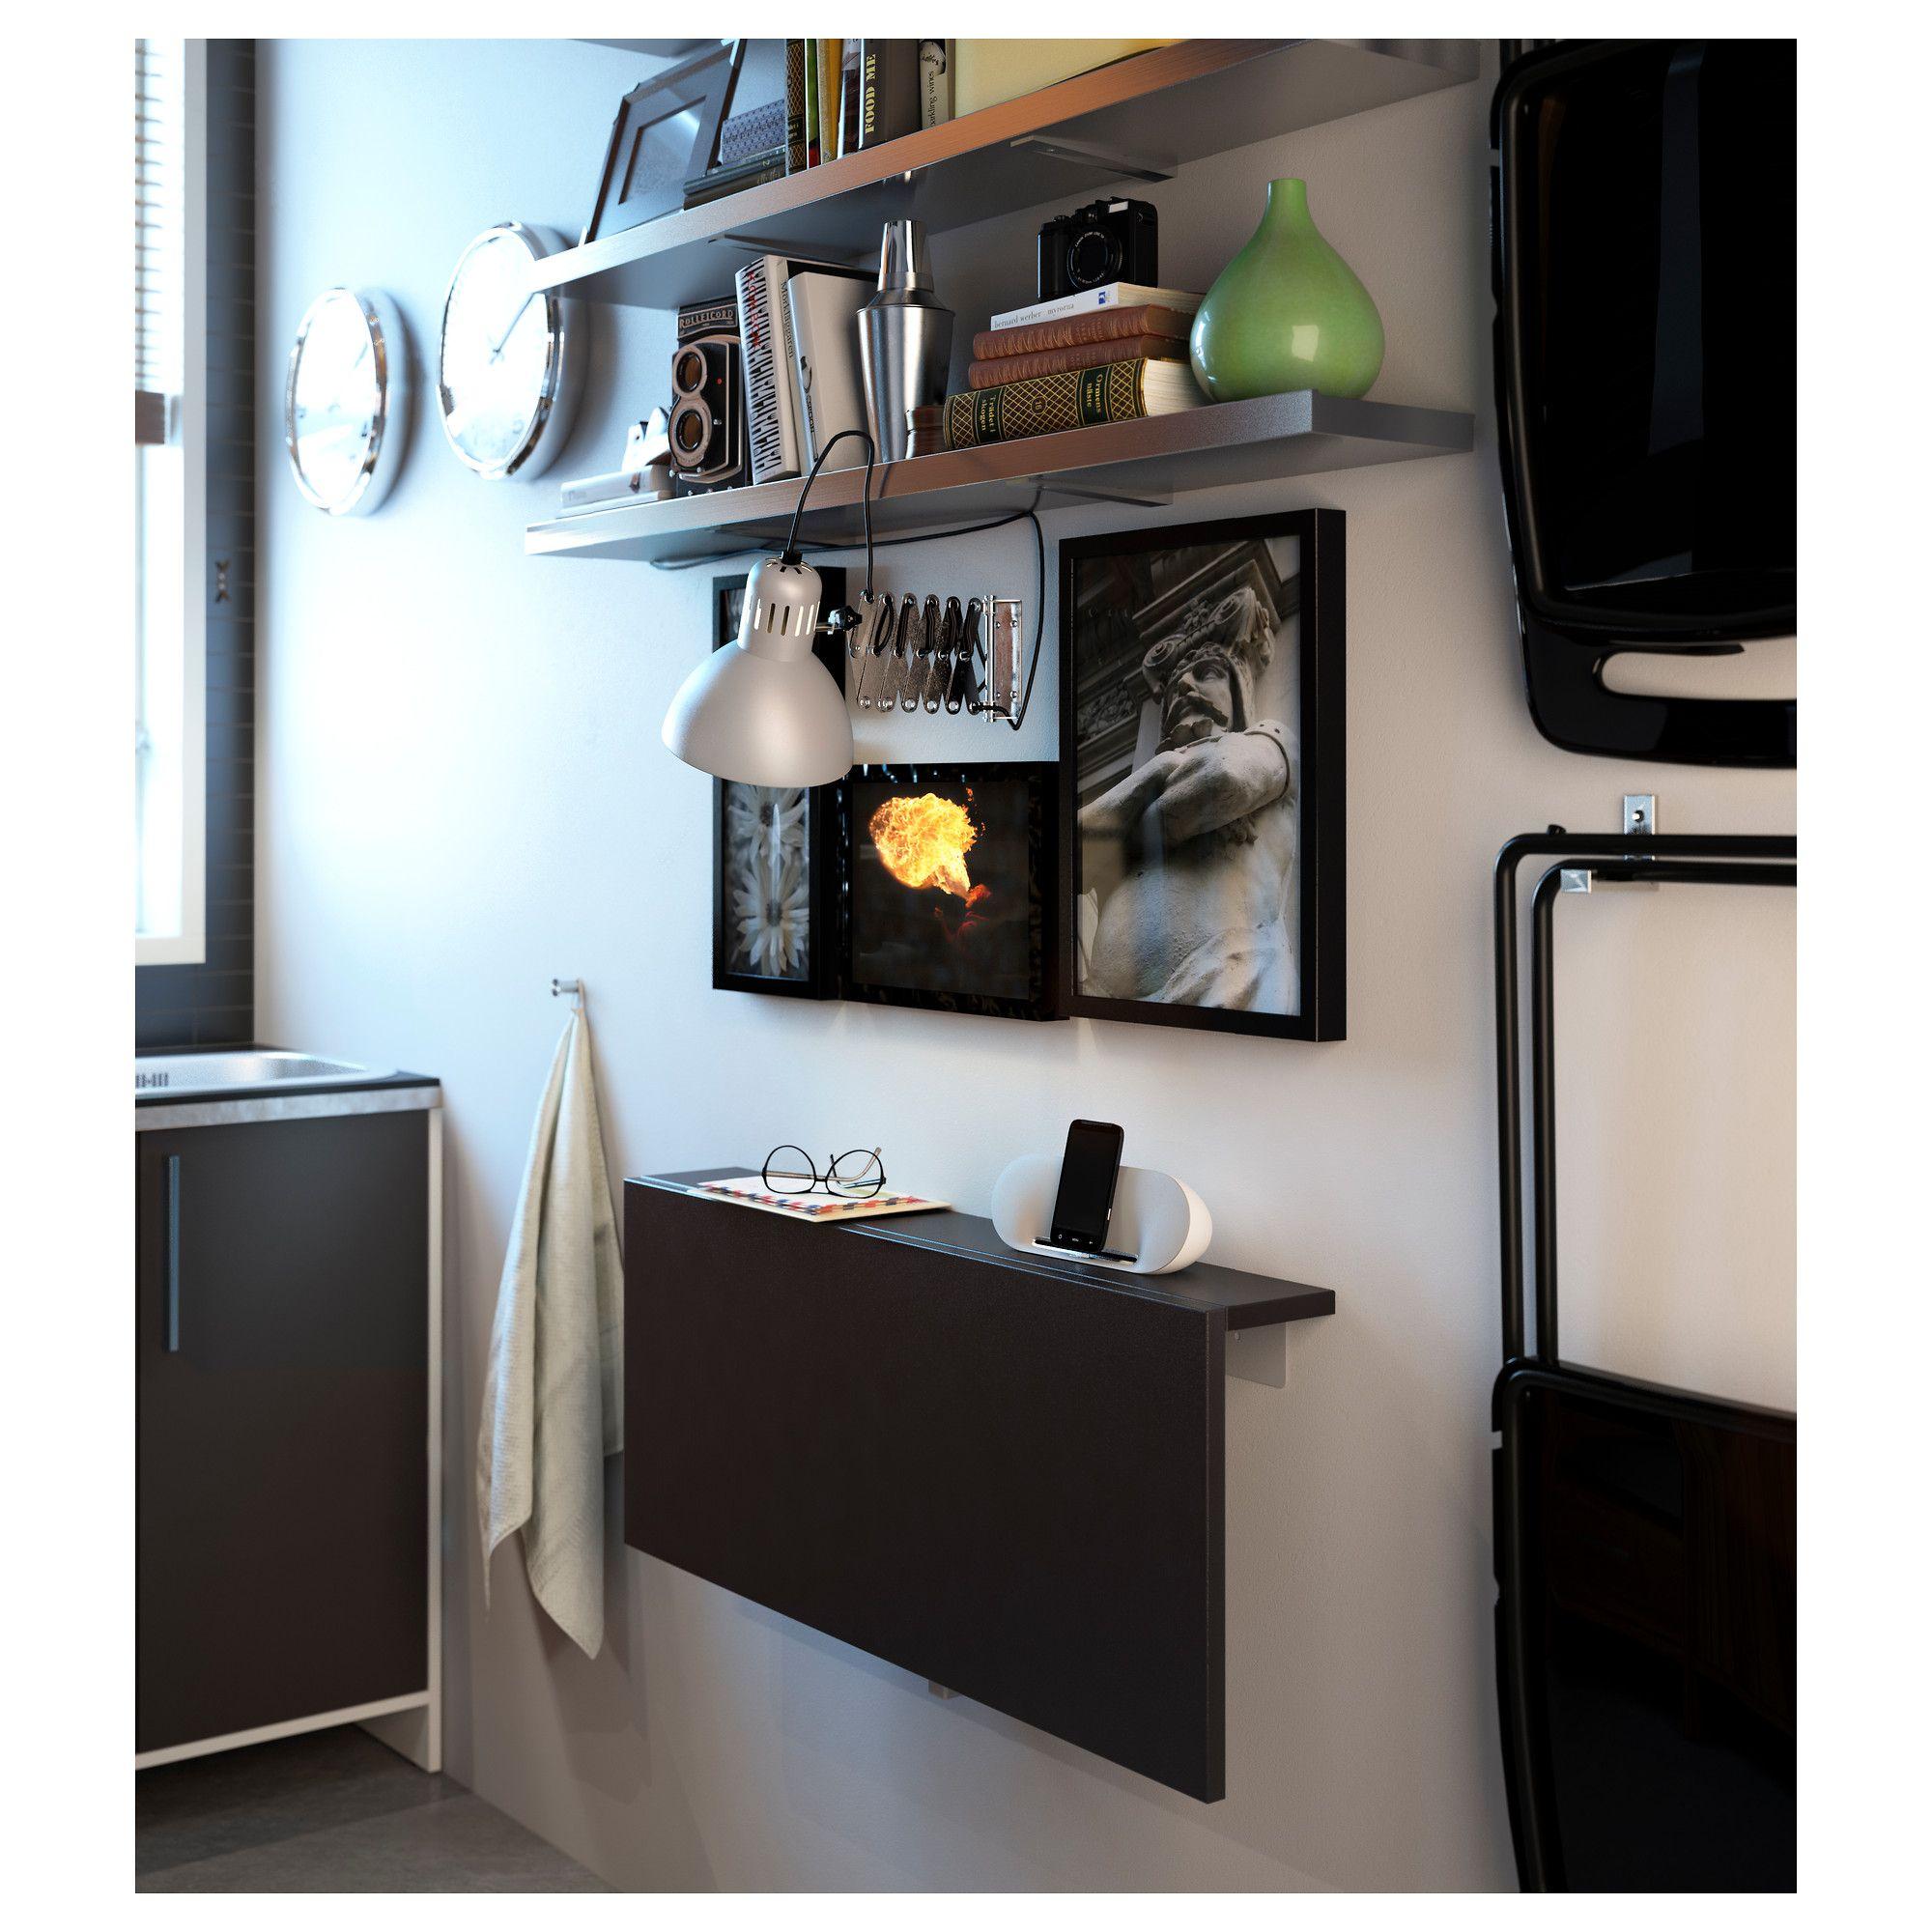 Ikea muddus klapptisch  BJURSTA Wall-mounted drop-leaf table, brown-black | Drop leaf ...